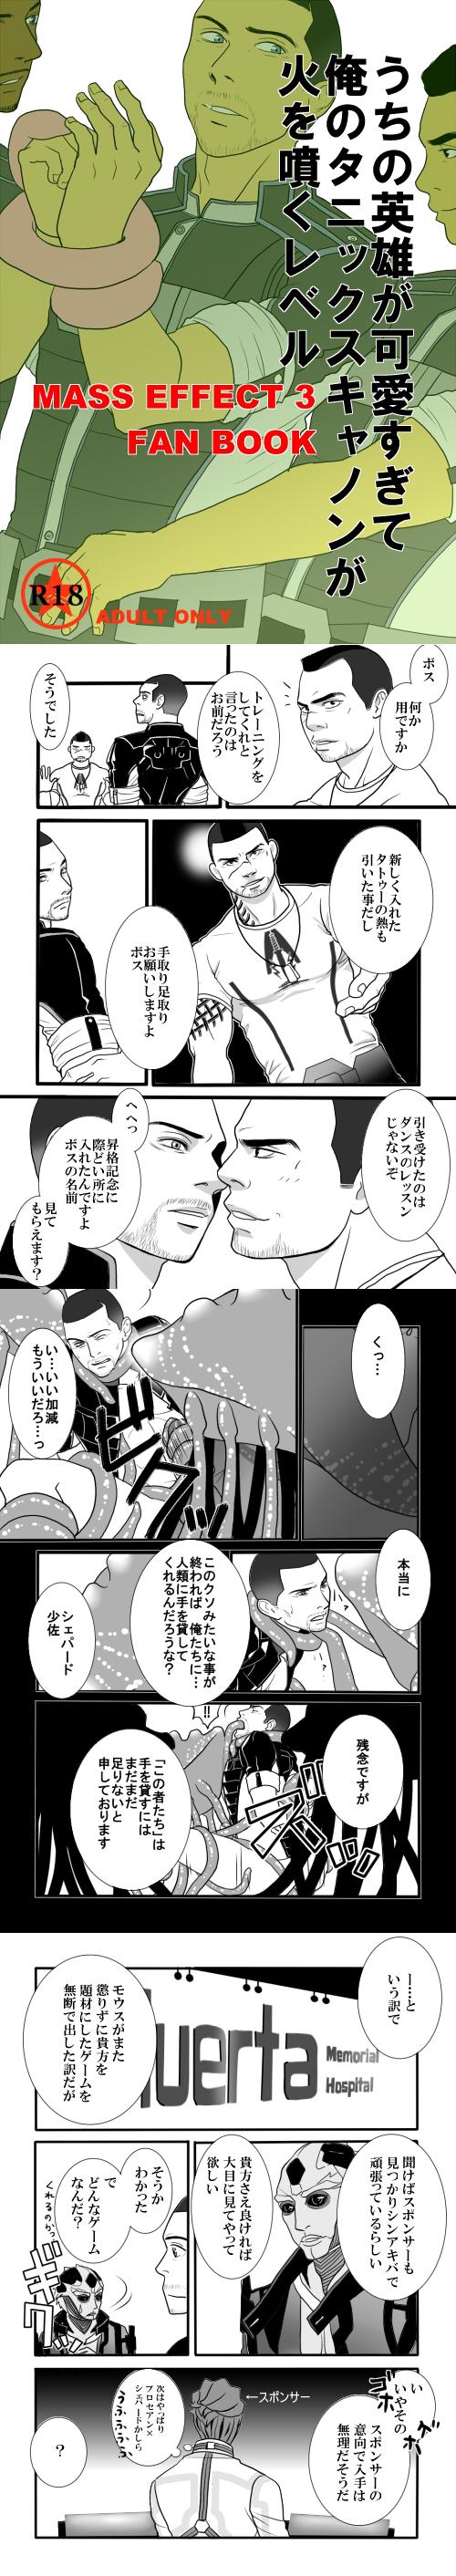 alexandria ocasio cortez Takagi_(tansuke)